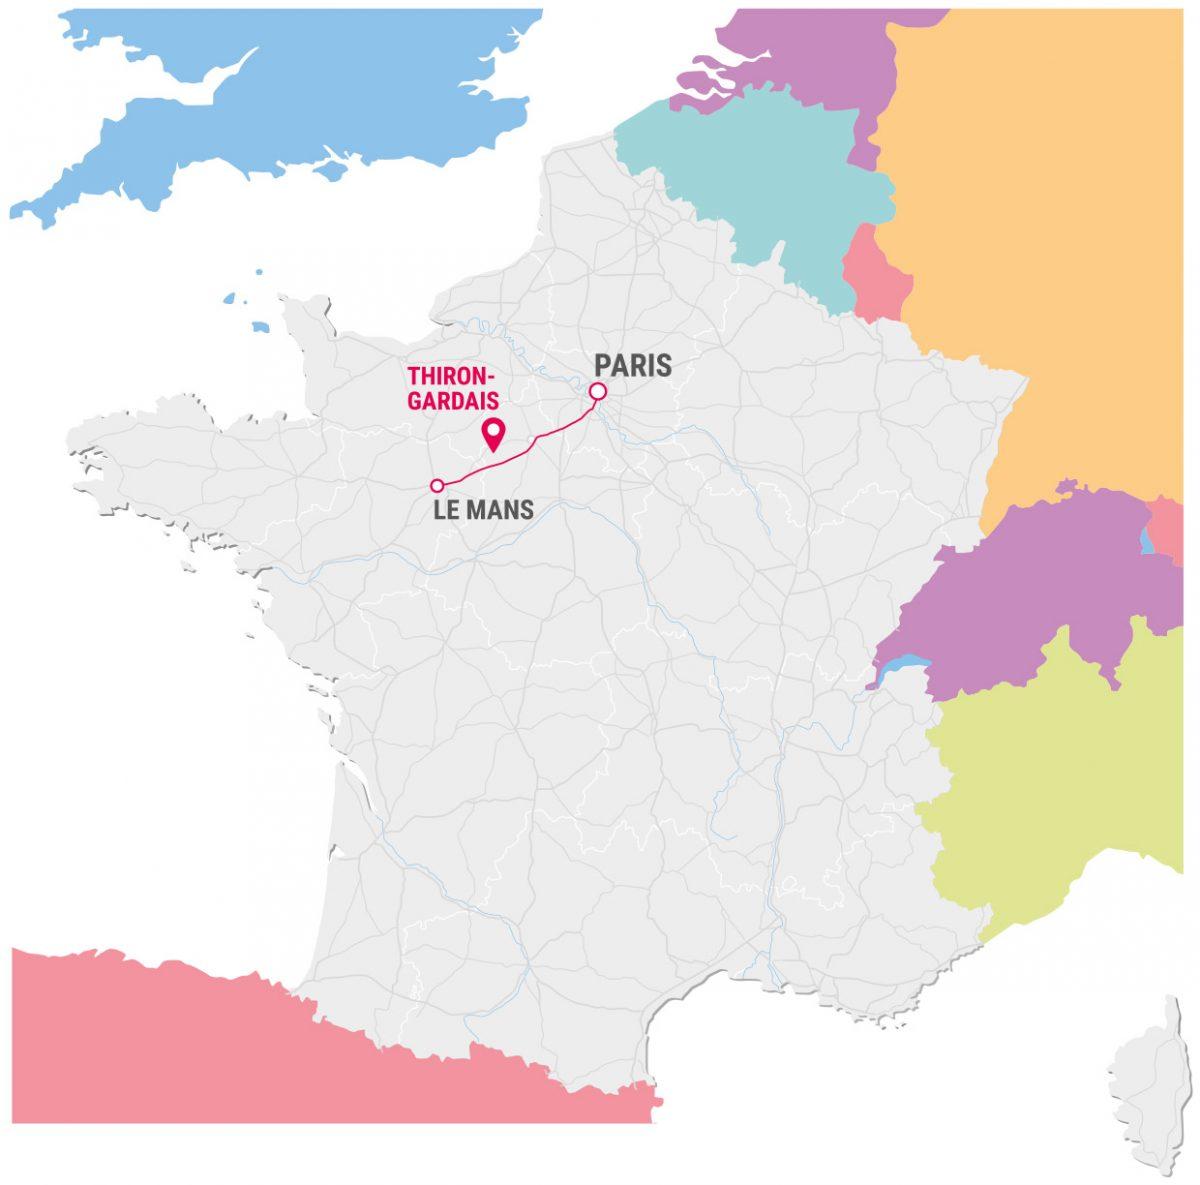 le mans carte france Clip Location in France, Perch